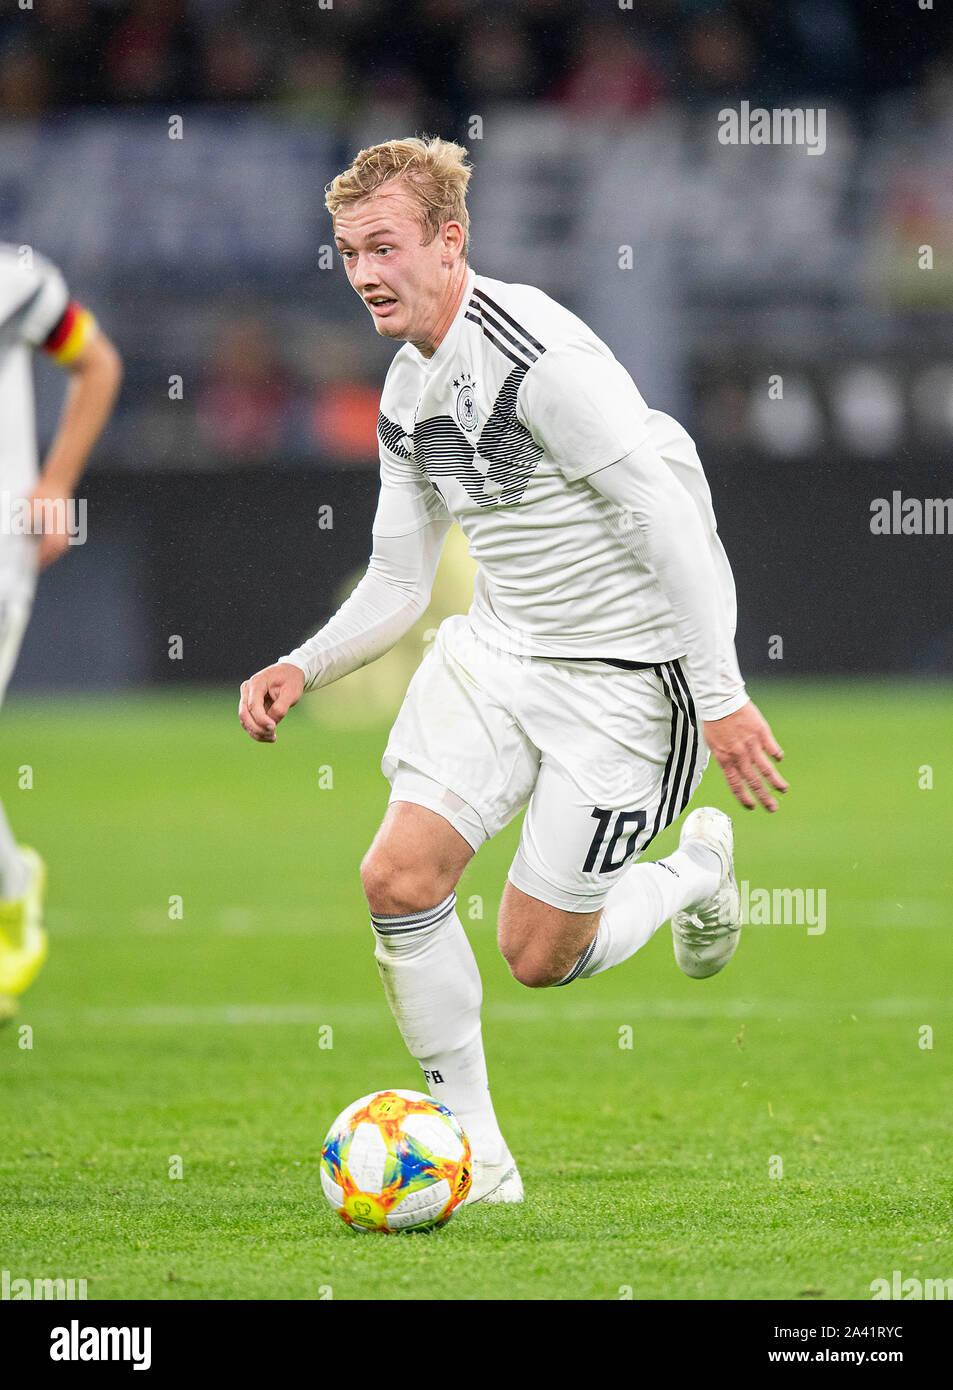 Julian BRANDT (GER) Promotion, Football Laenderpiel, Friendly Match, Germany (GER) - Argentina (ARG) 2: 2, on 09/10/2019 in Dortmund/Germany. ¬ | usage worldwide Stock Photo